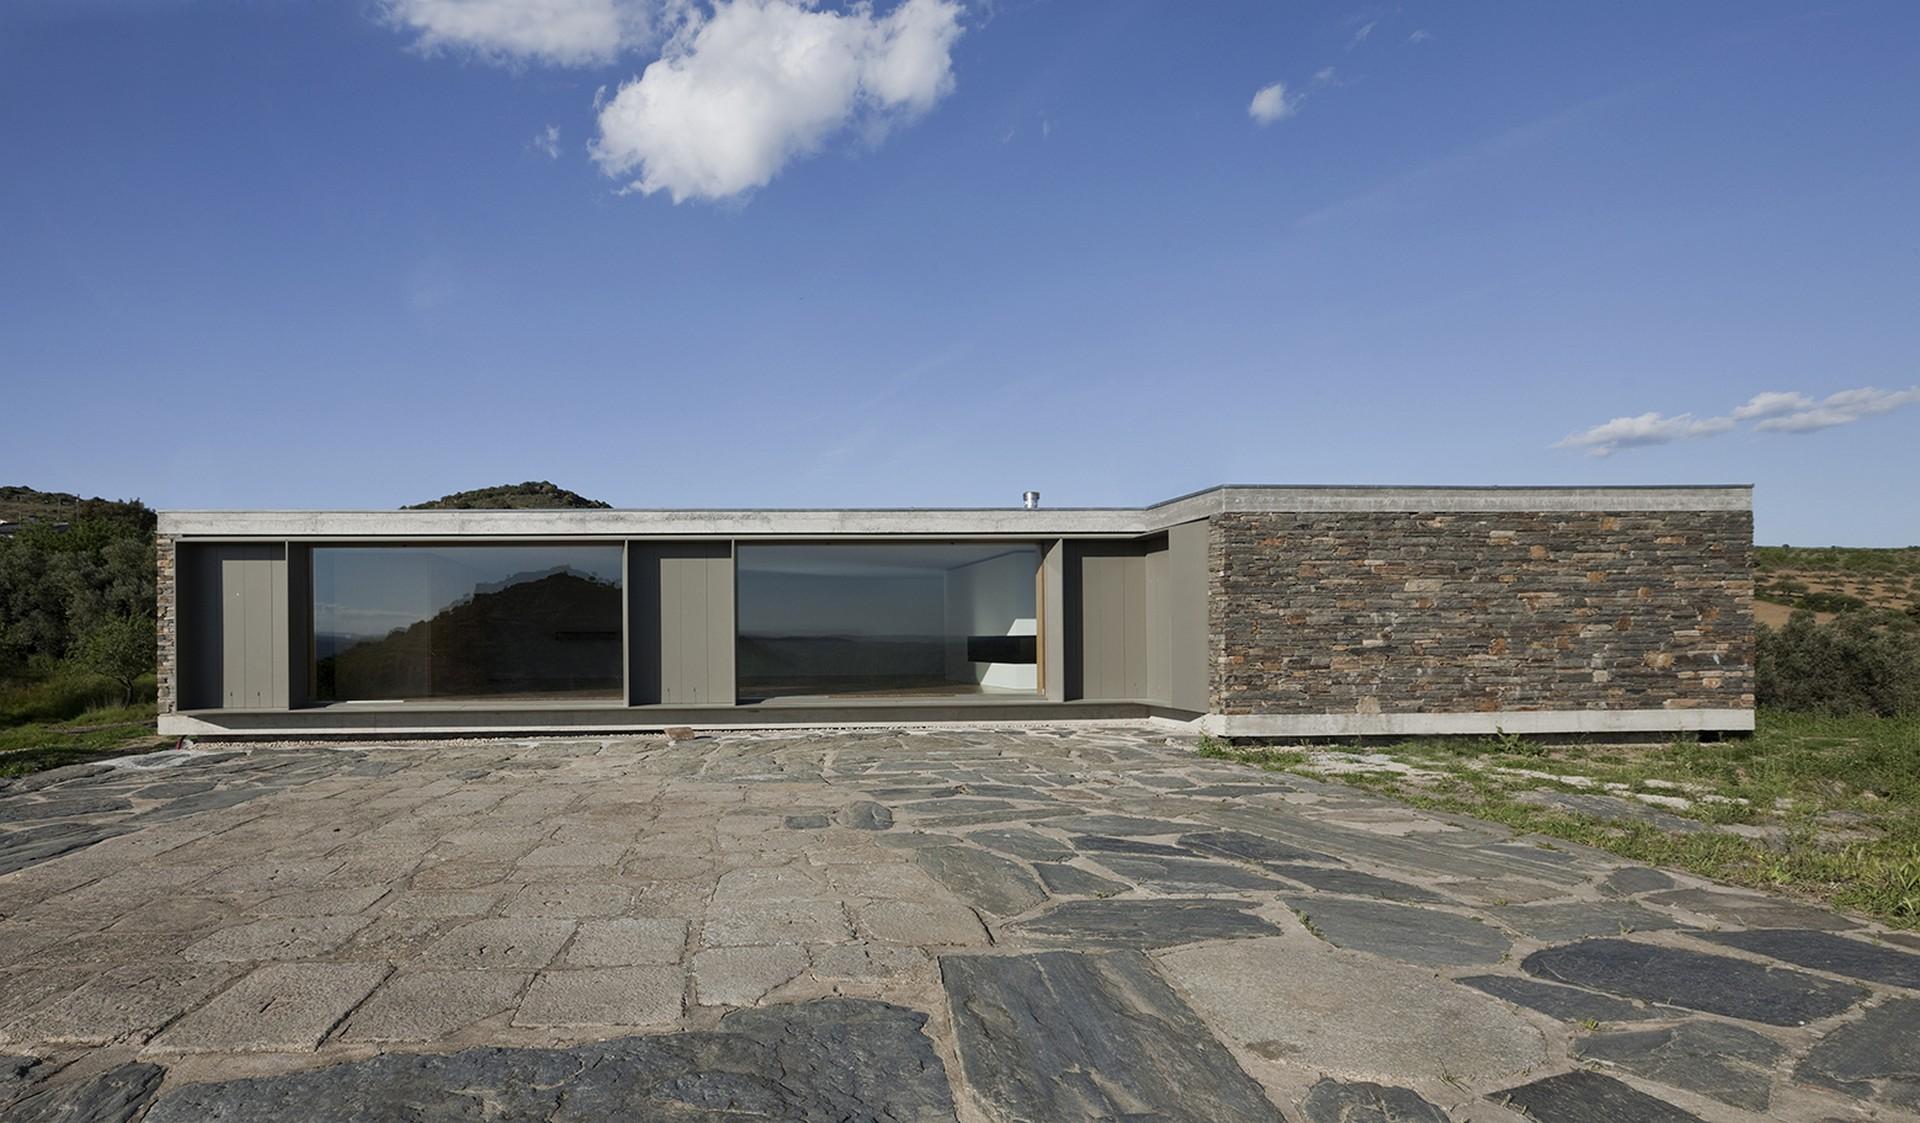 Best Architecture Projects 5 best architecture projects Best Architecture Projects: theHouse by Correia/Ragazzi Arquitectos Best Architecture Projects 5